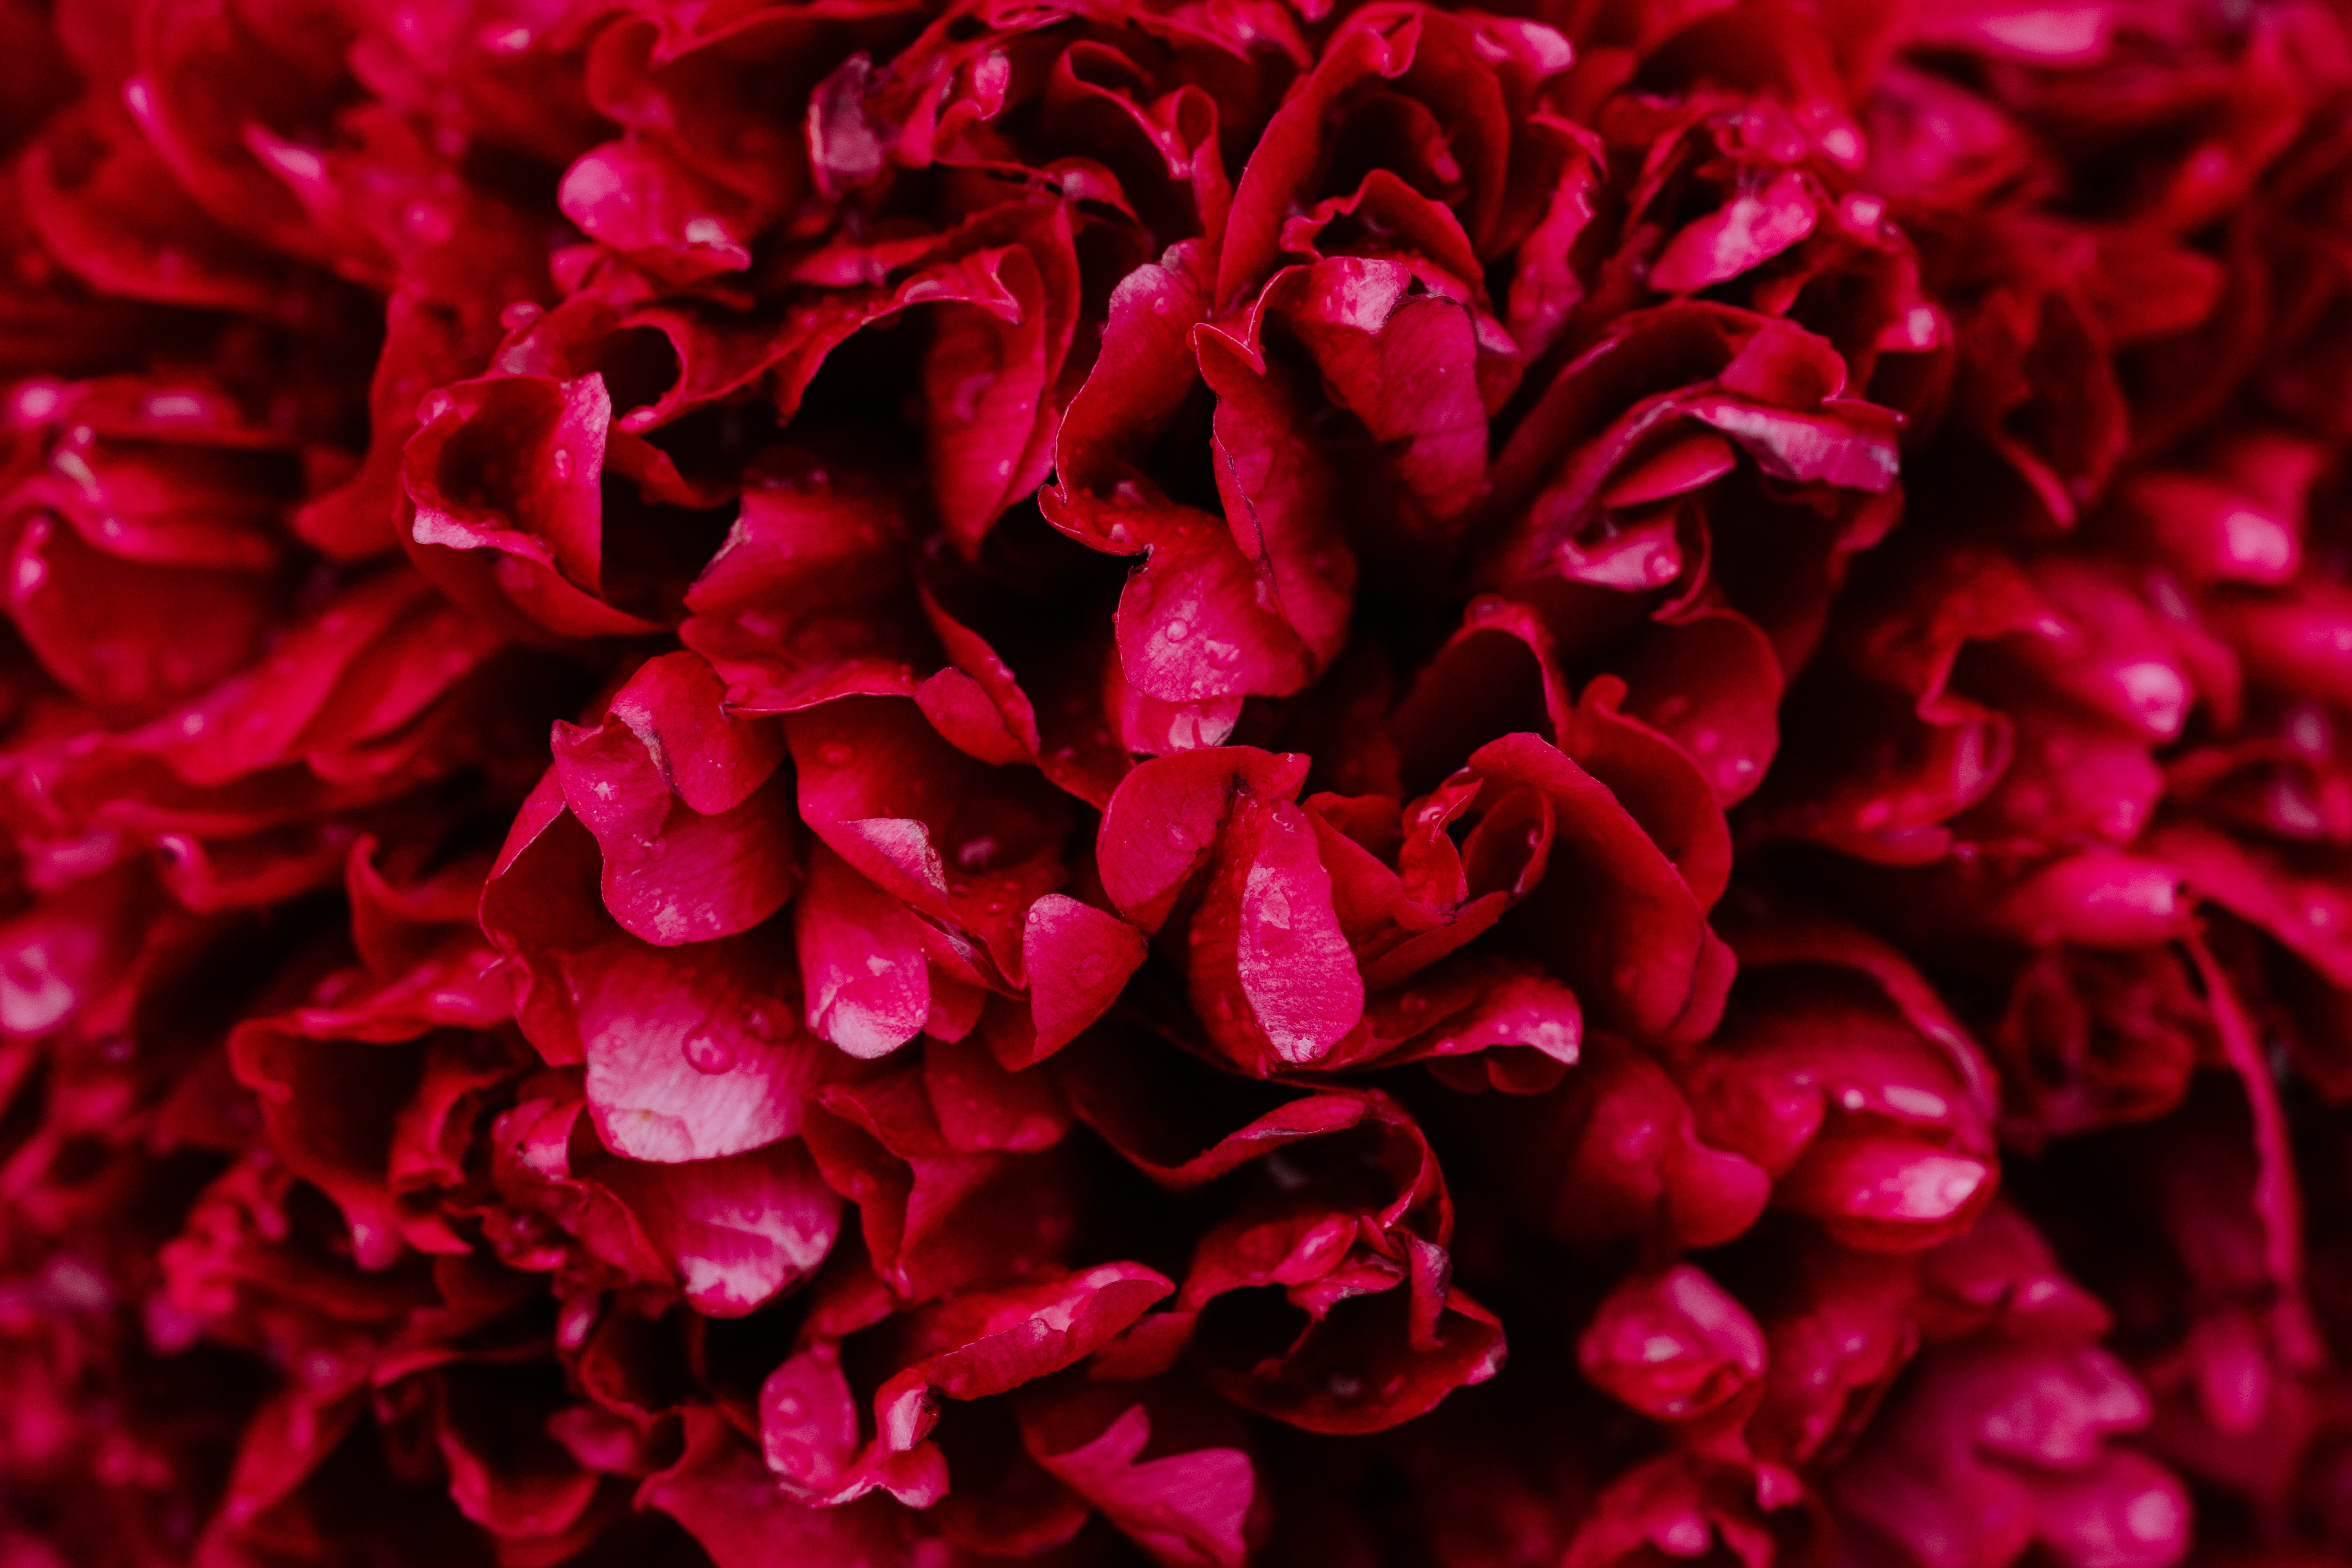 red roses 4k 1606577682 - Red Roses 4k - Red Roses 4k wallpapers